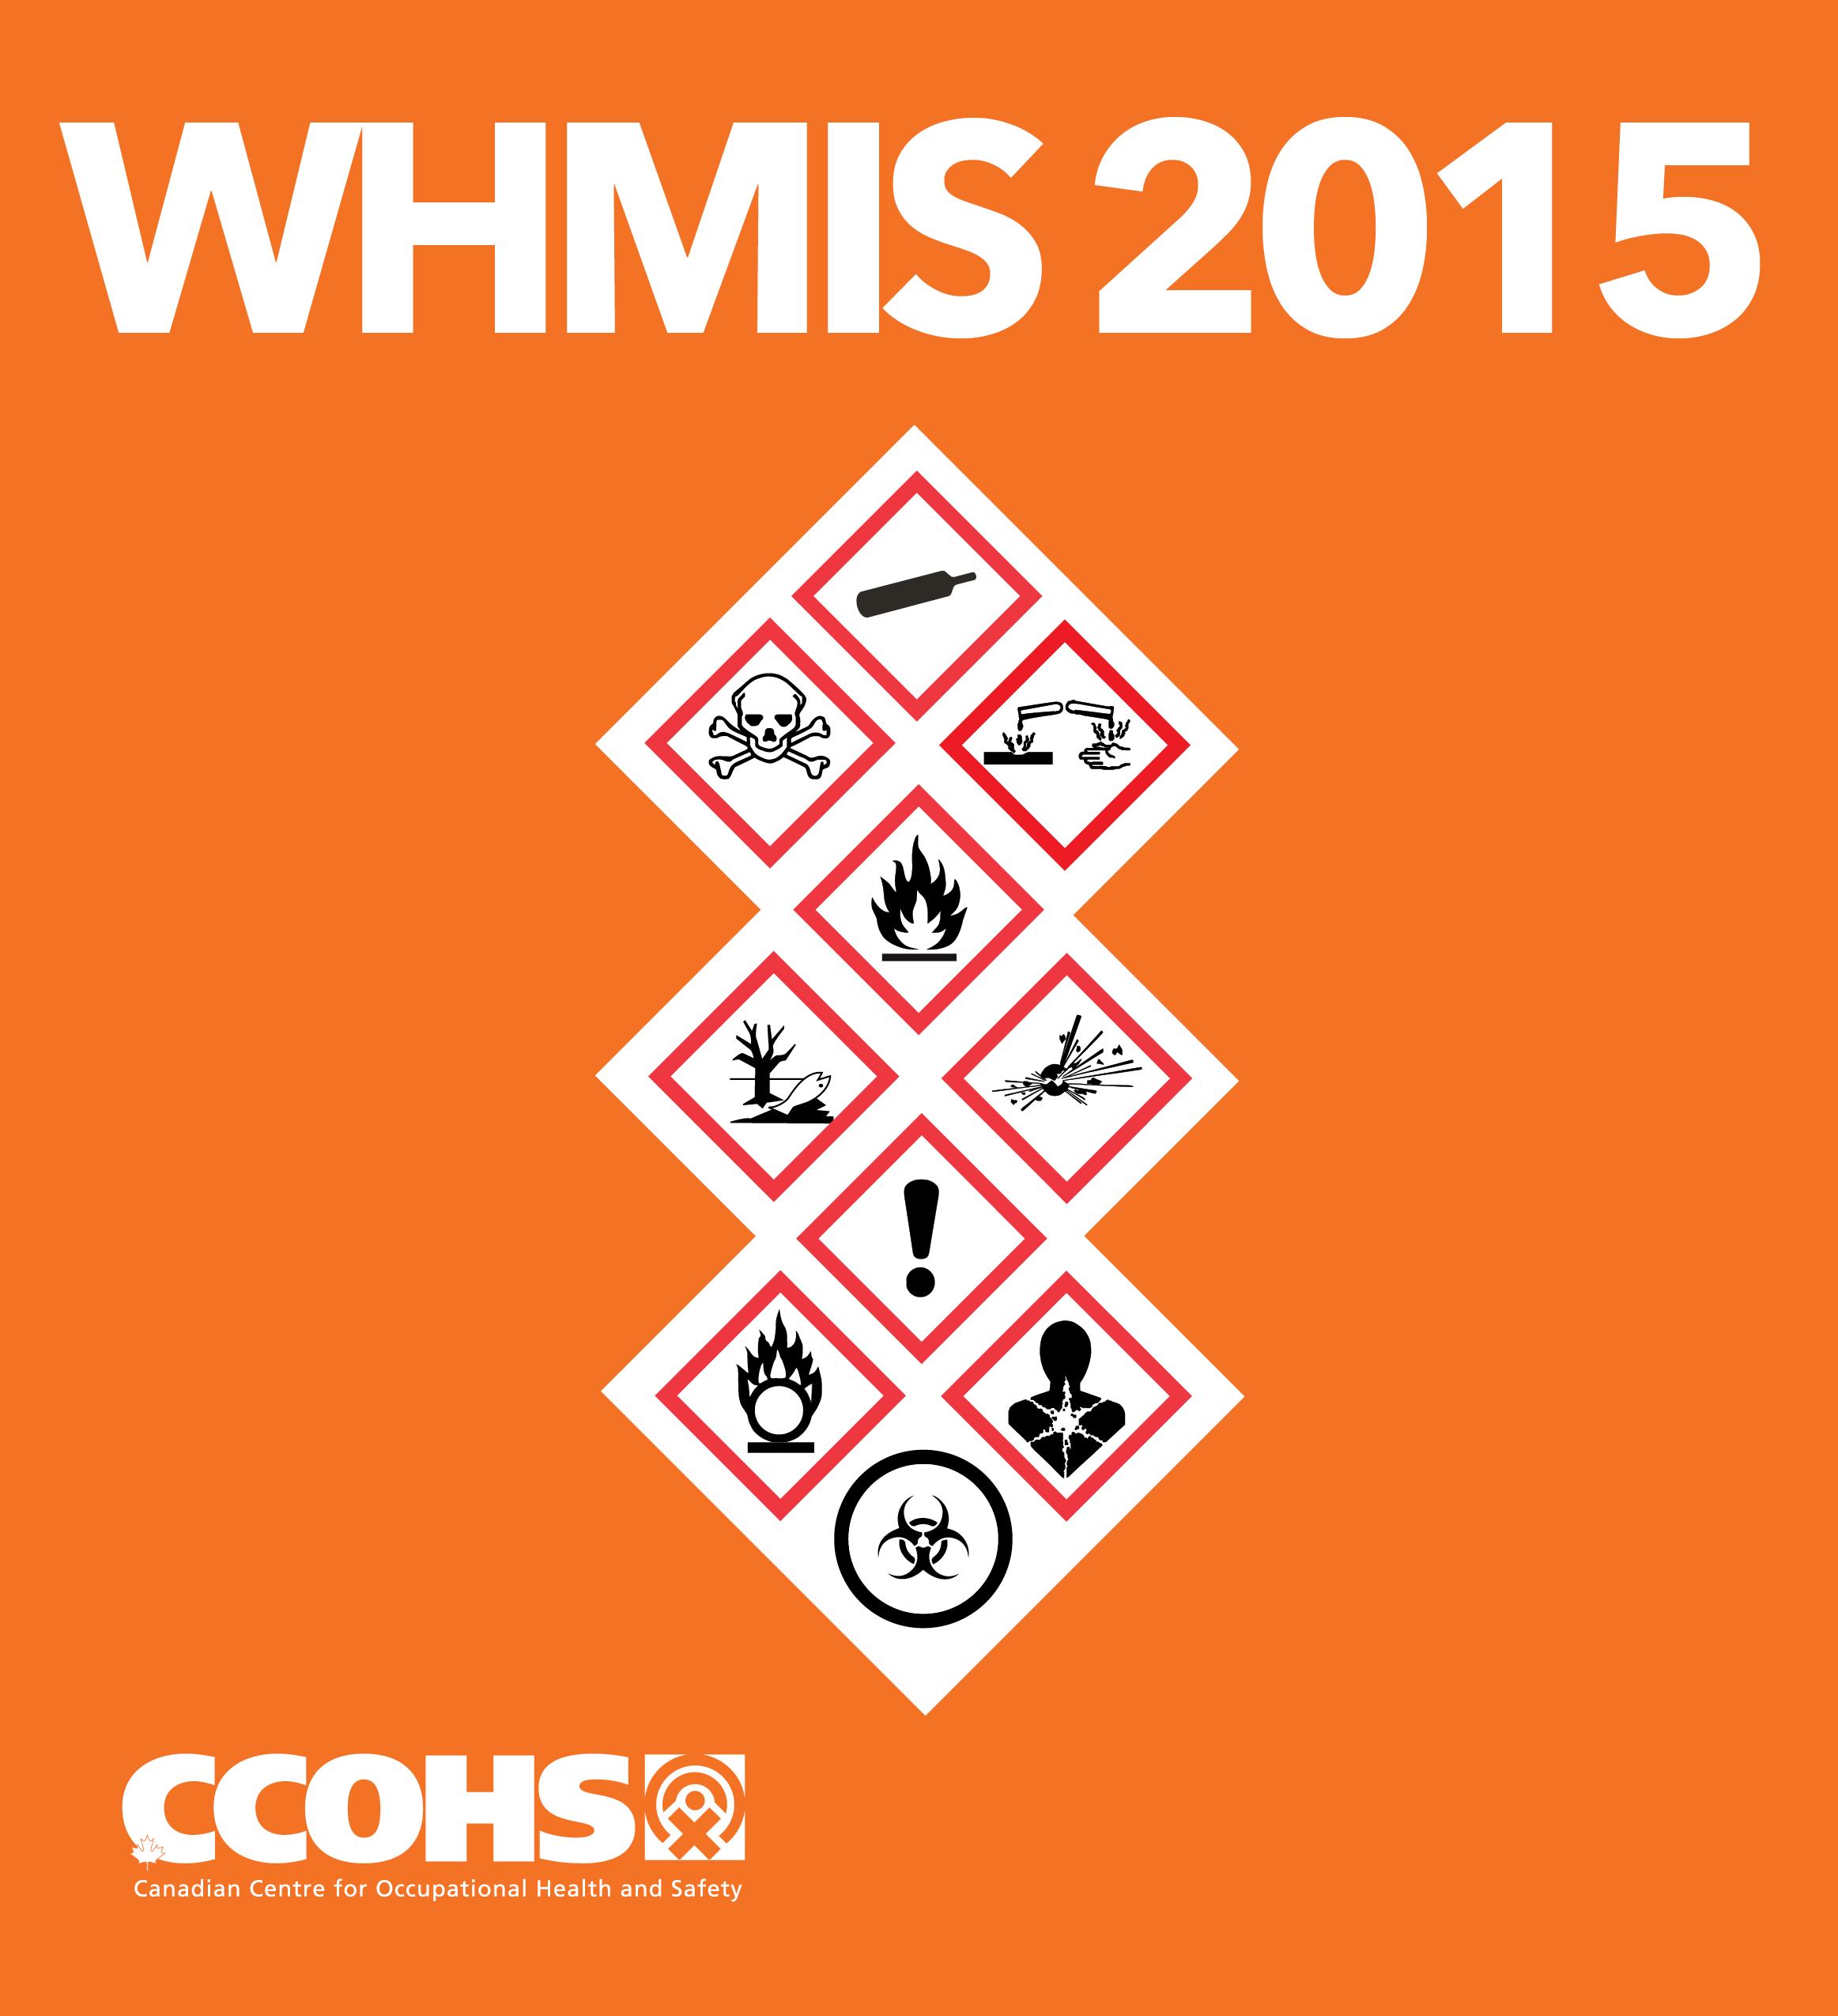 WHMIS 2015 poster's image